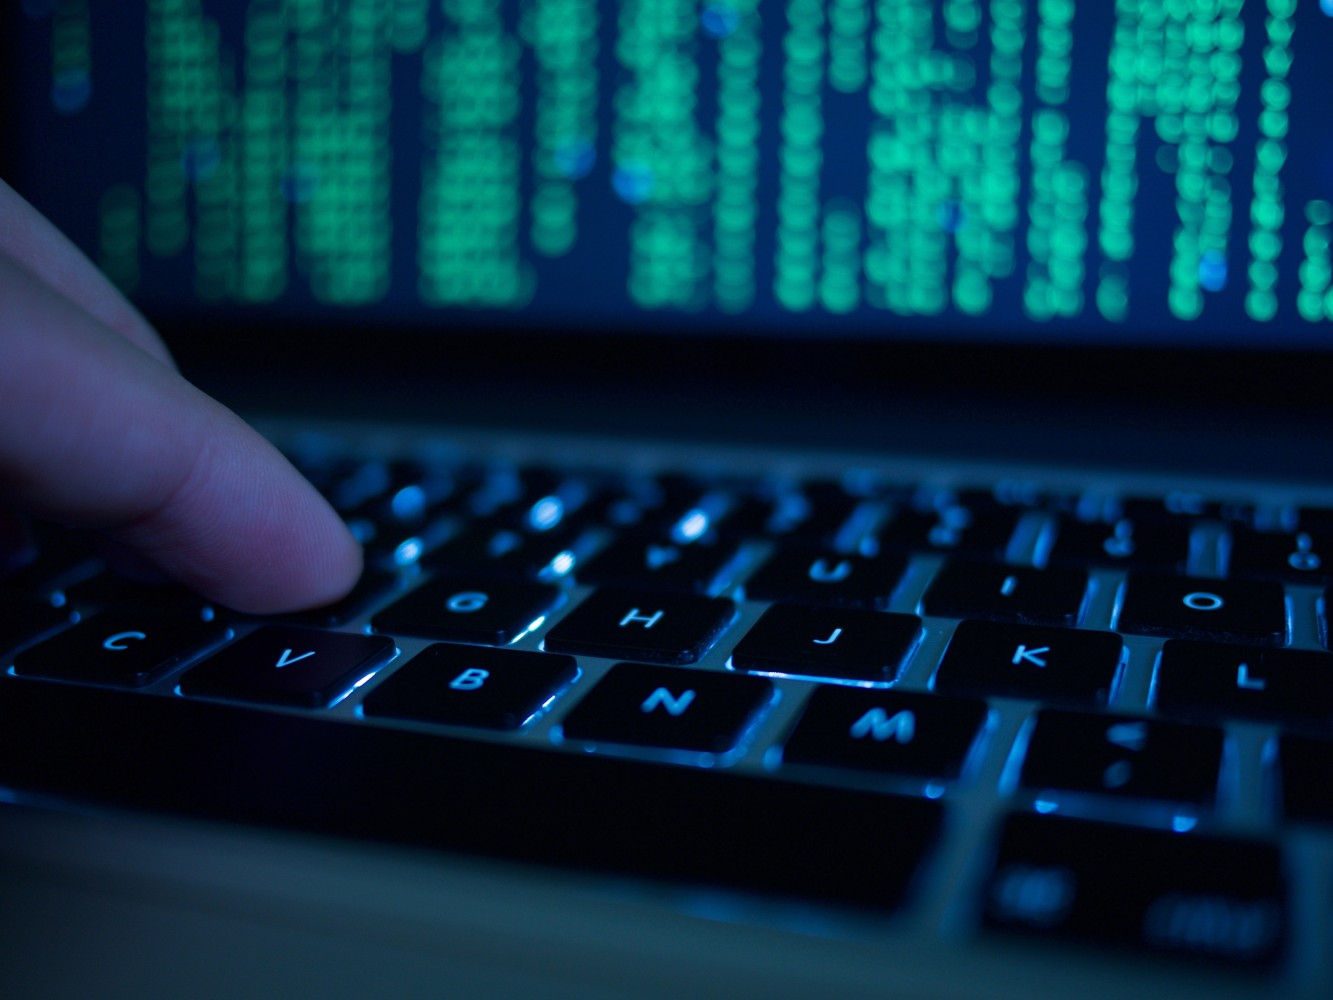 Image Computer Hacker Typing On Keyboard